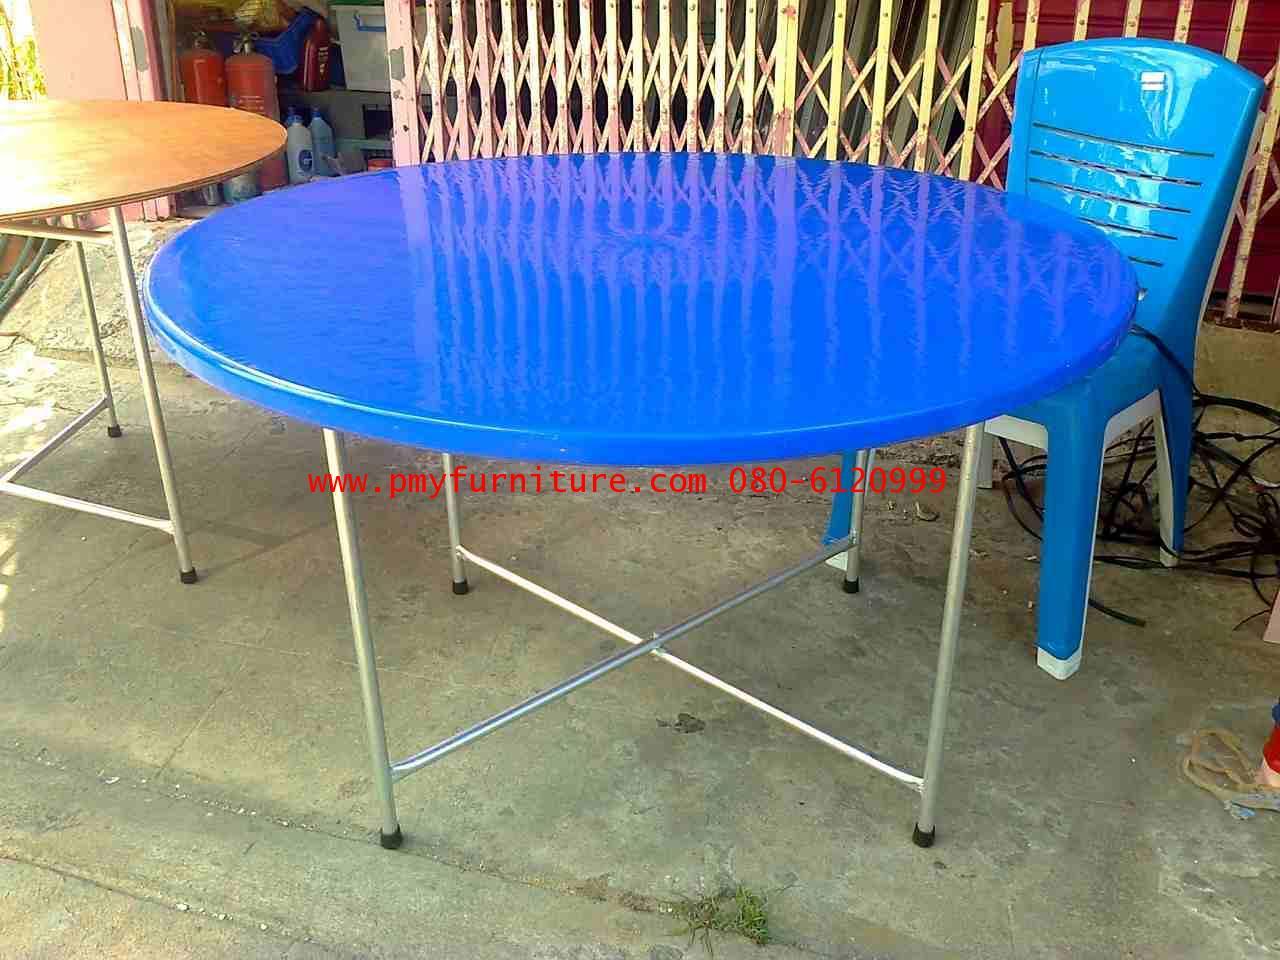 pmy20-18 ชุดโต๊ะจีนพลาสติกเกรด A เส้นผ่านศูนย์กลาง 120 ซม. พร้อมขาเหล็ก รุ่นนืยม